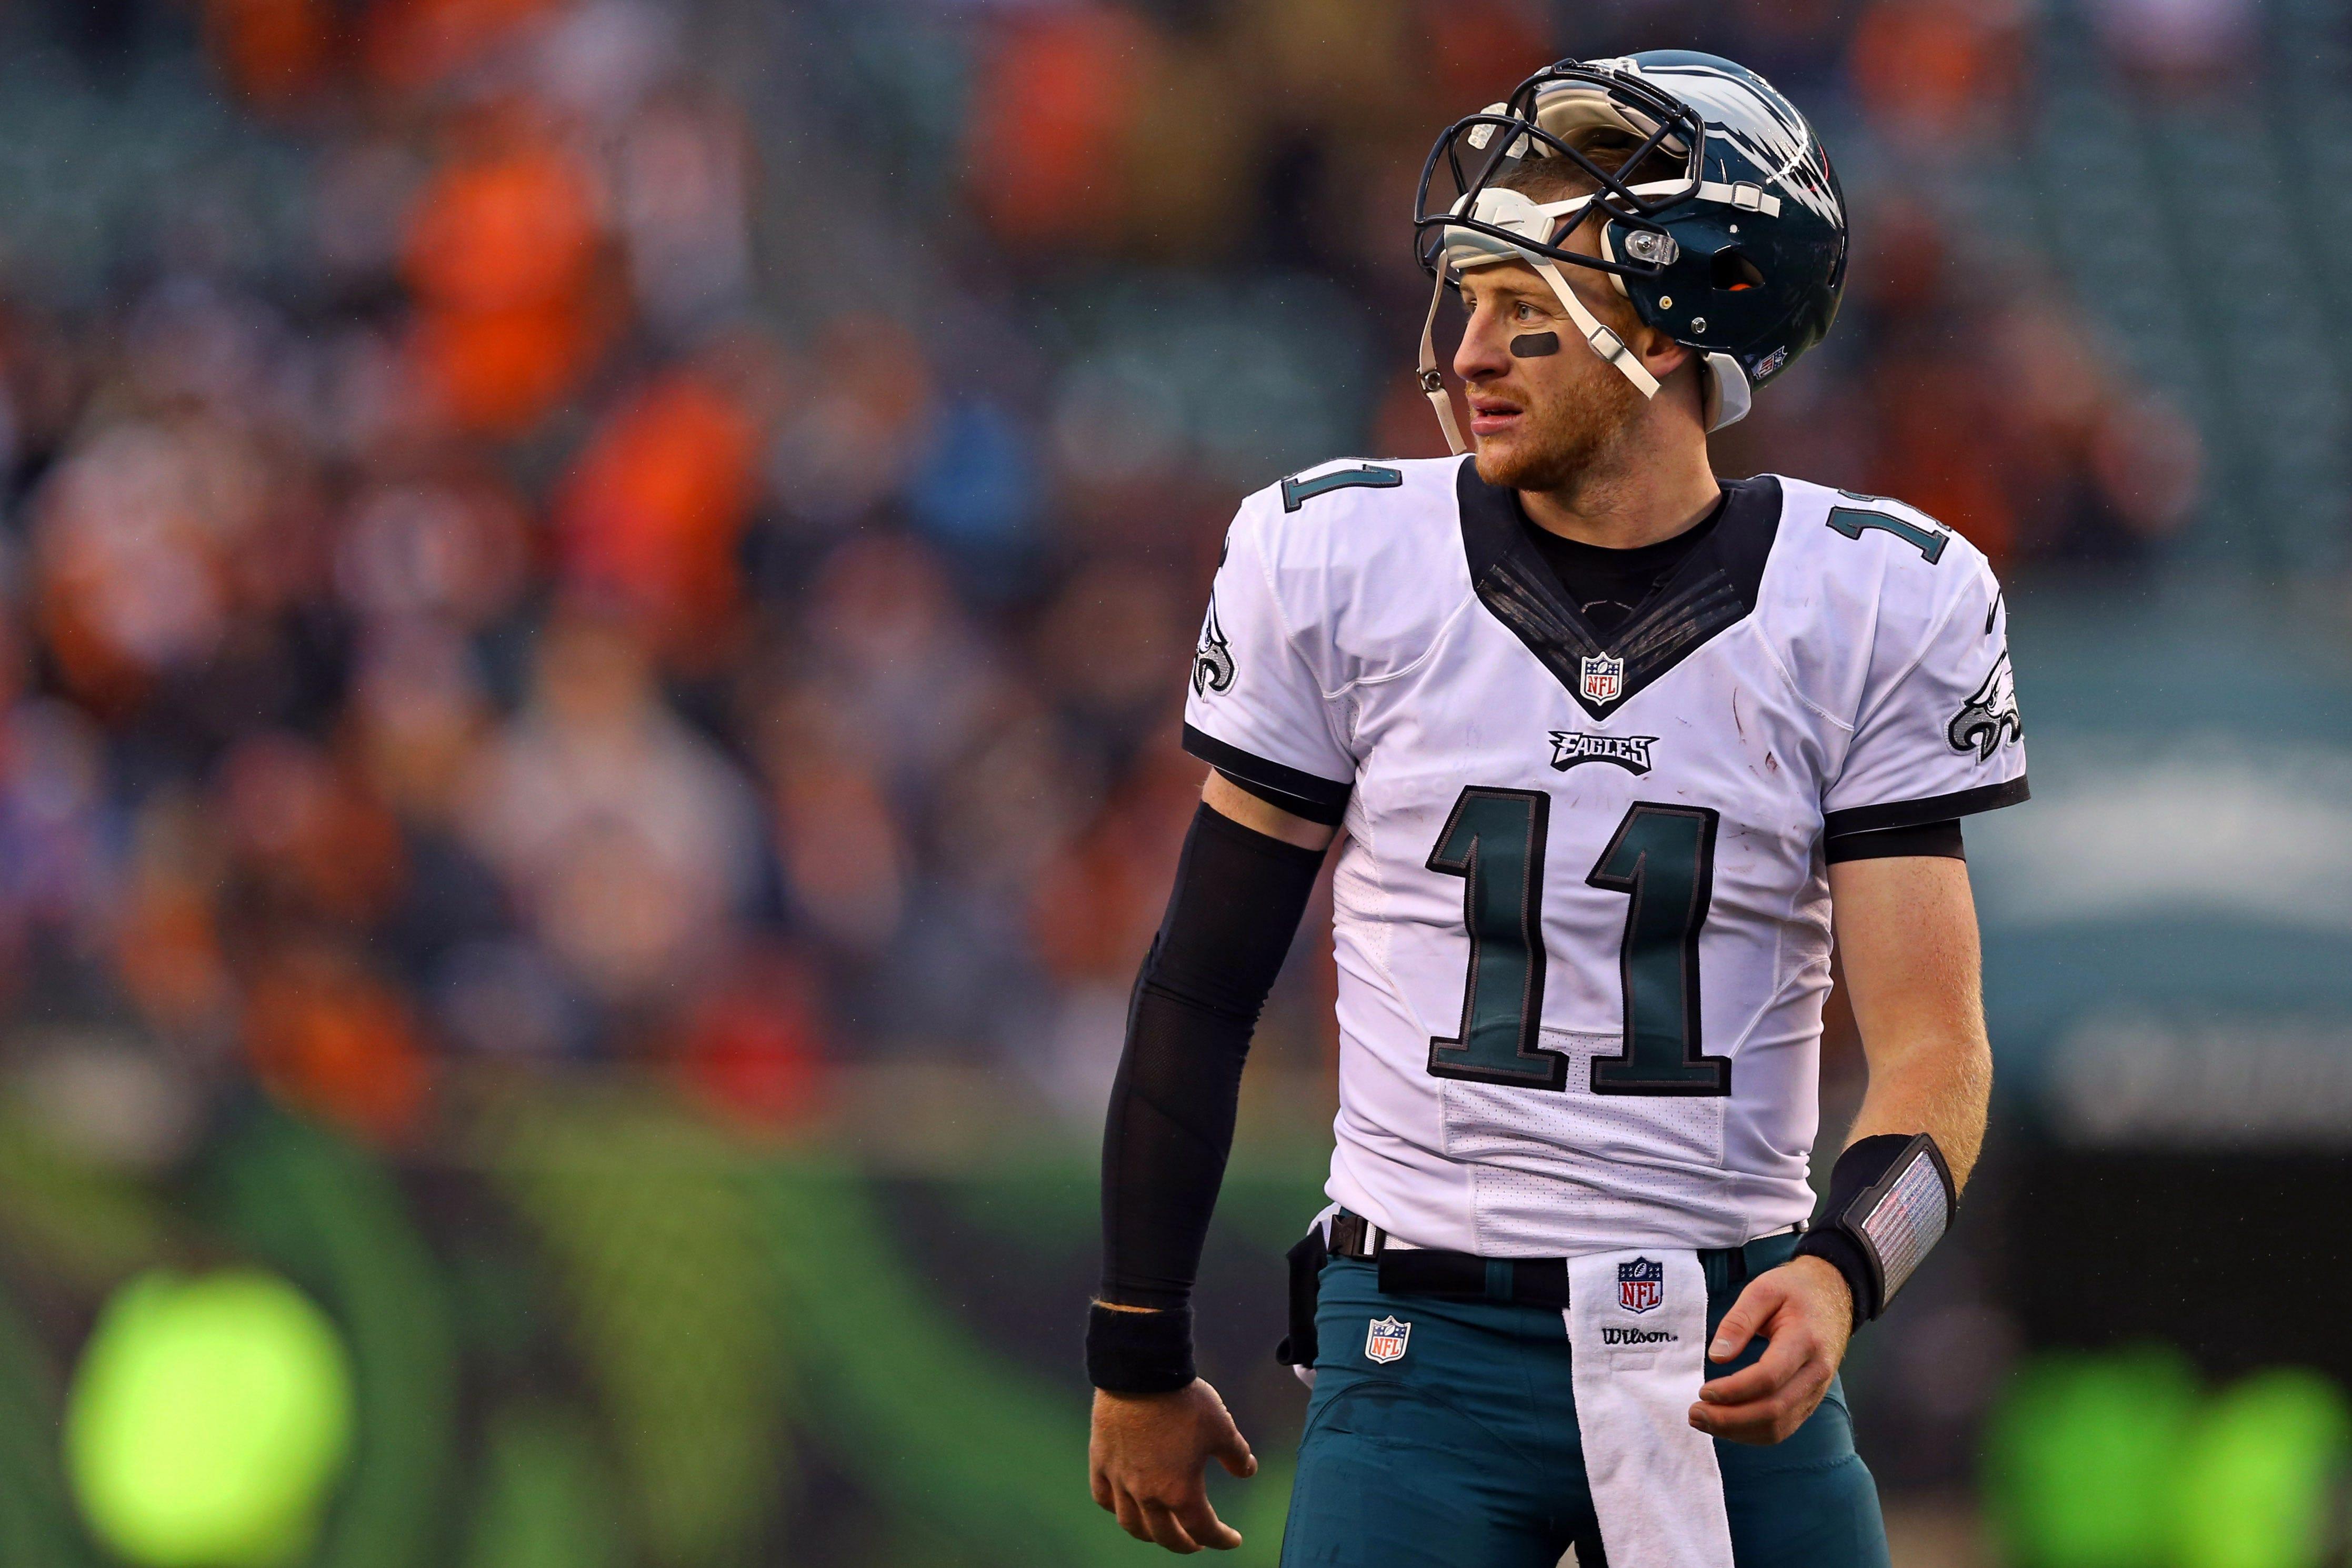 Philadelphia Eagles players push back on report labeling QB Carson Wentz as 'selfish'